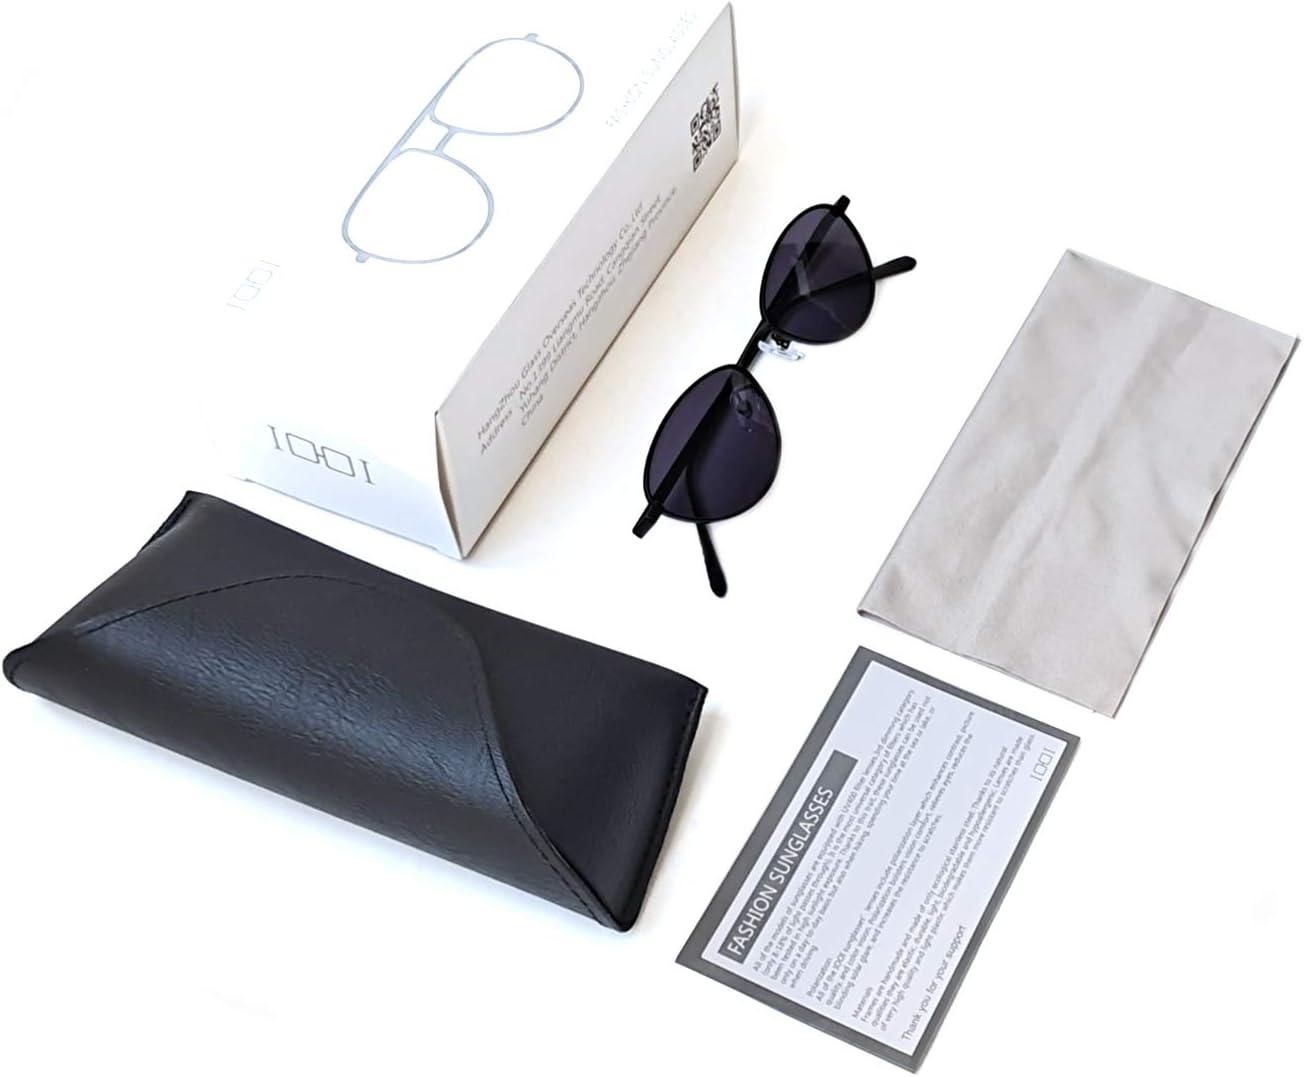 IOOI Sunglasses Anti-Blue Light Oval cat Eye Small Glasses for Women Light Metal Frame and pc Lens Black Sunglasses